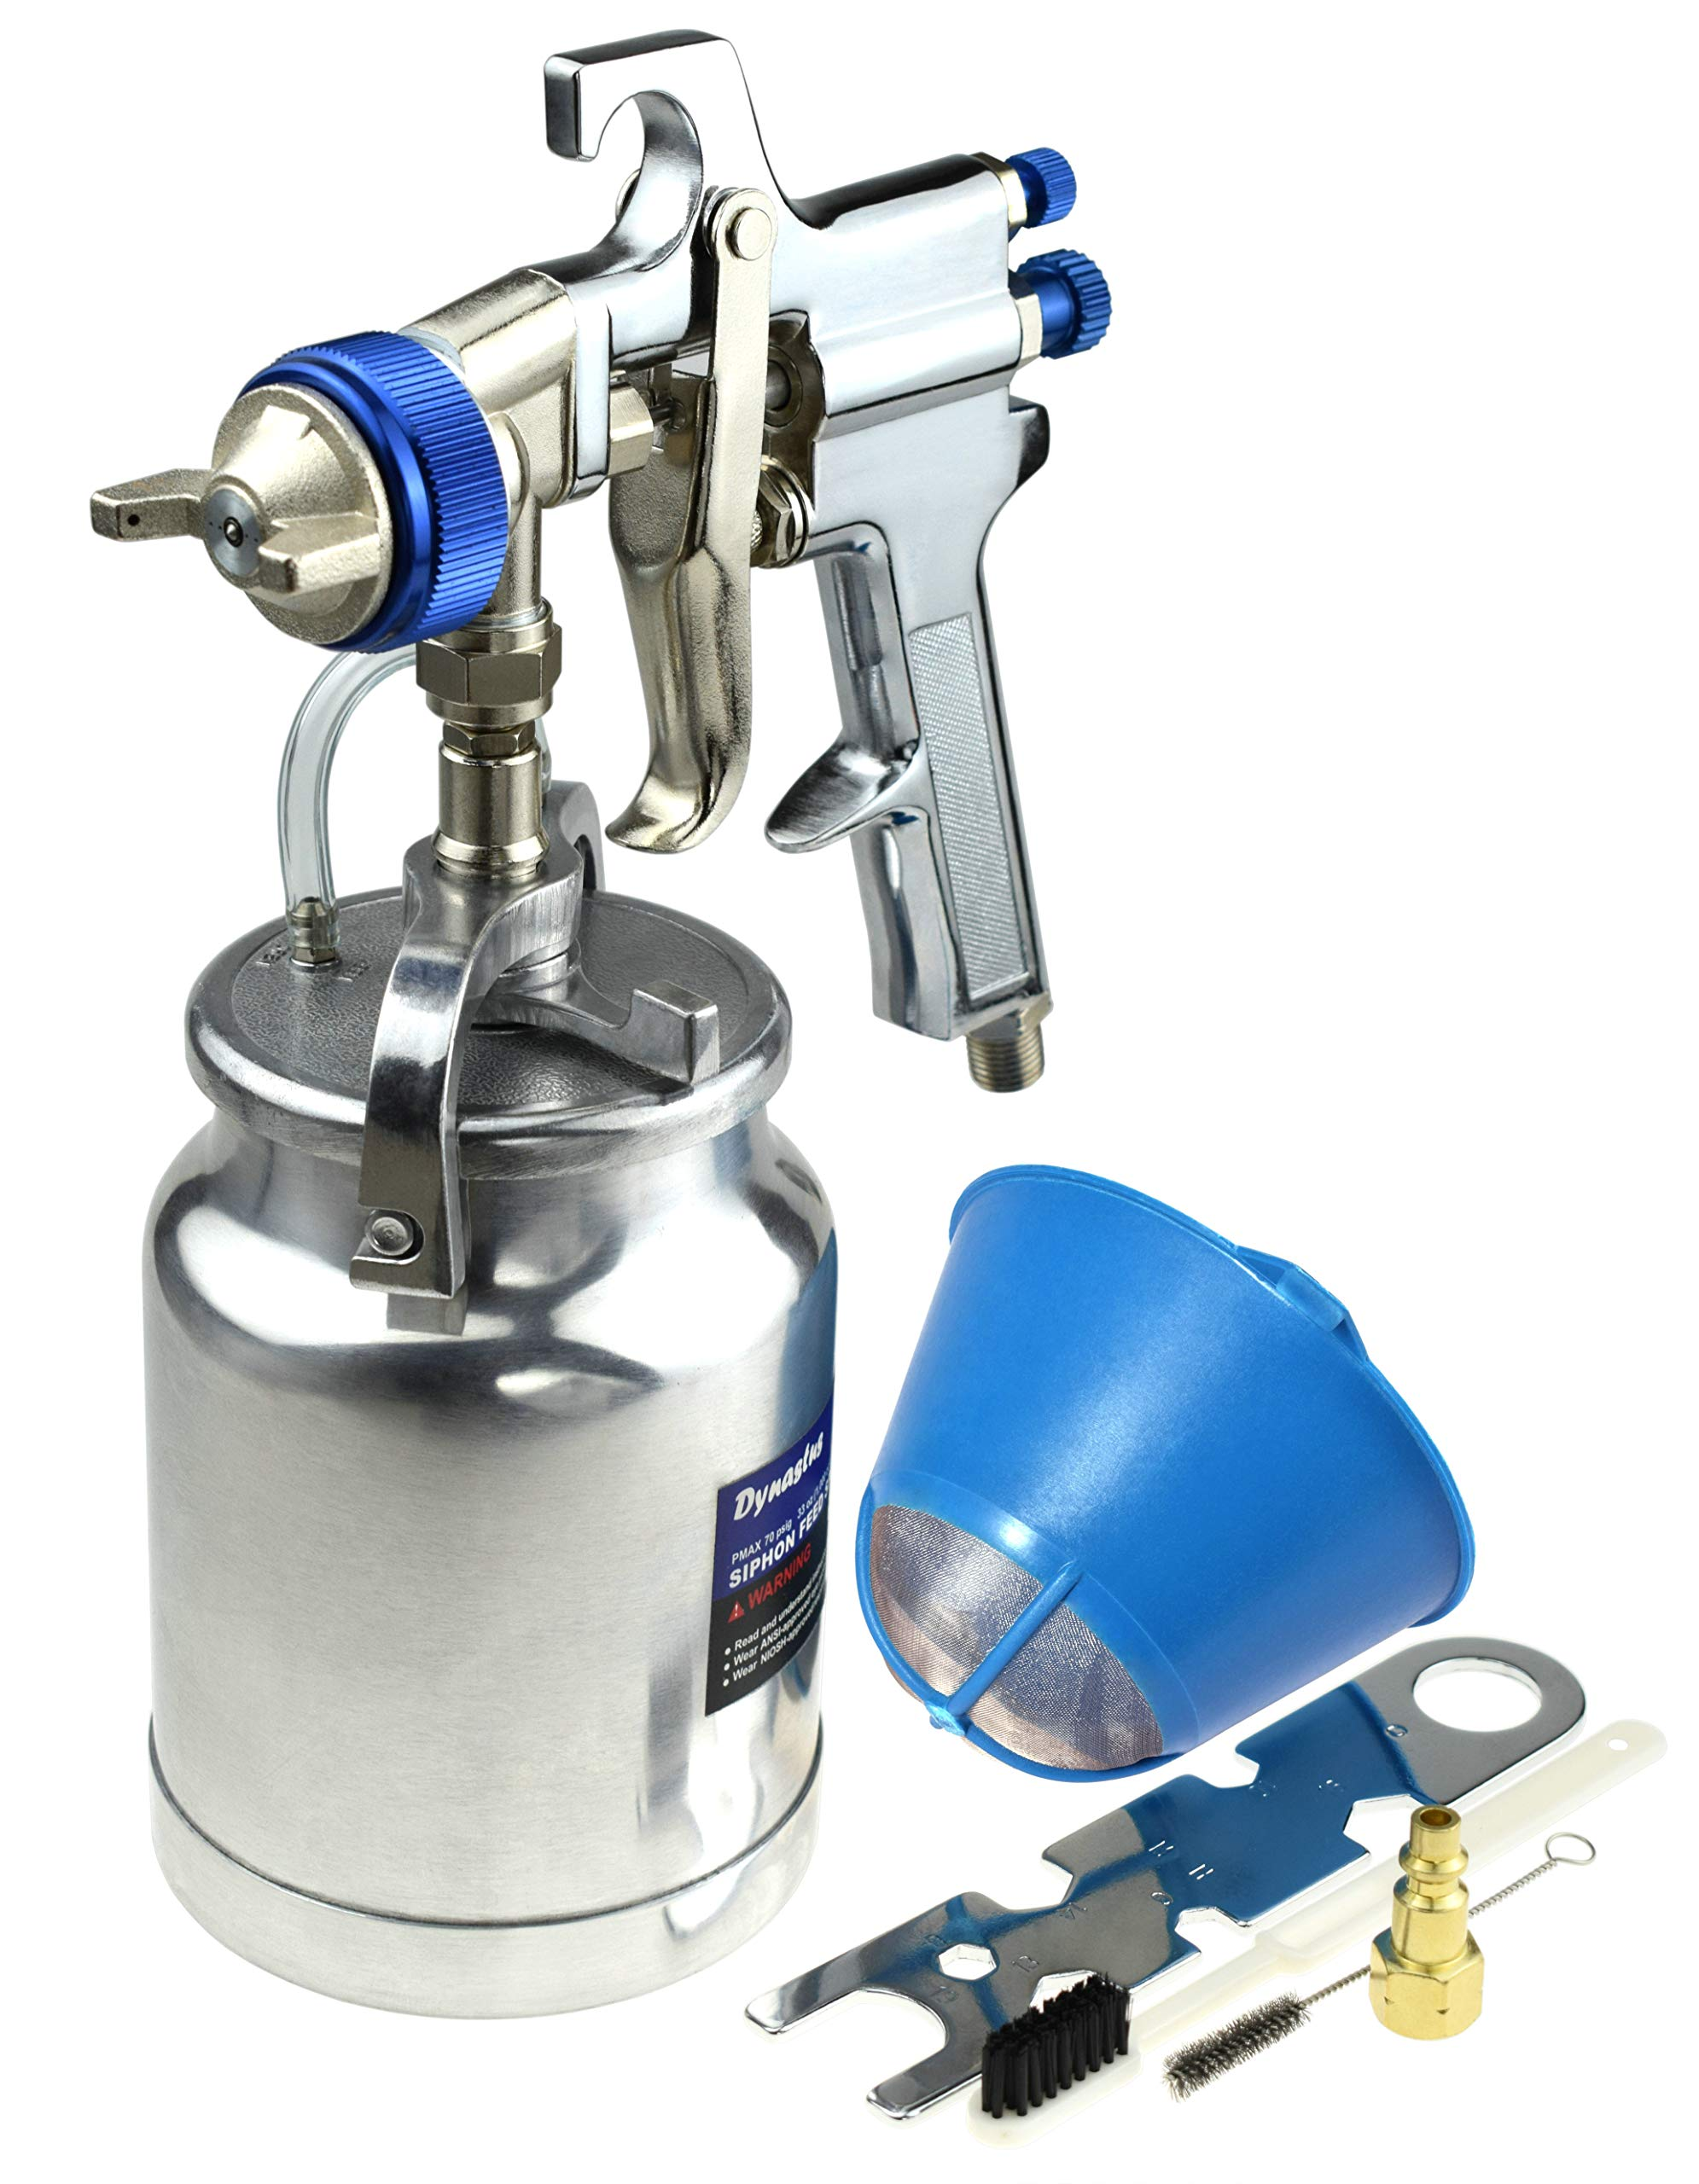 Siphon Feed Spray Gun Oil Based